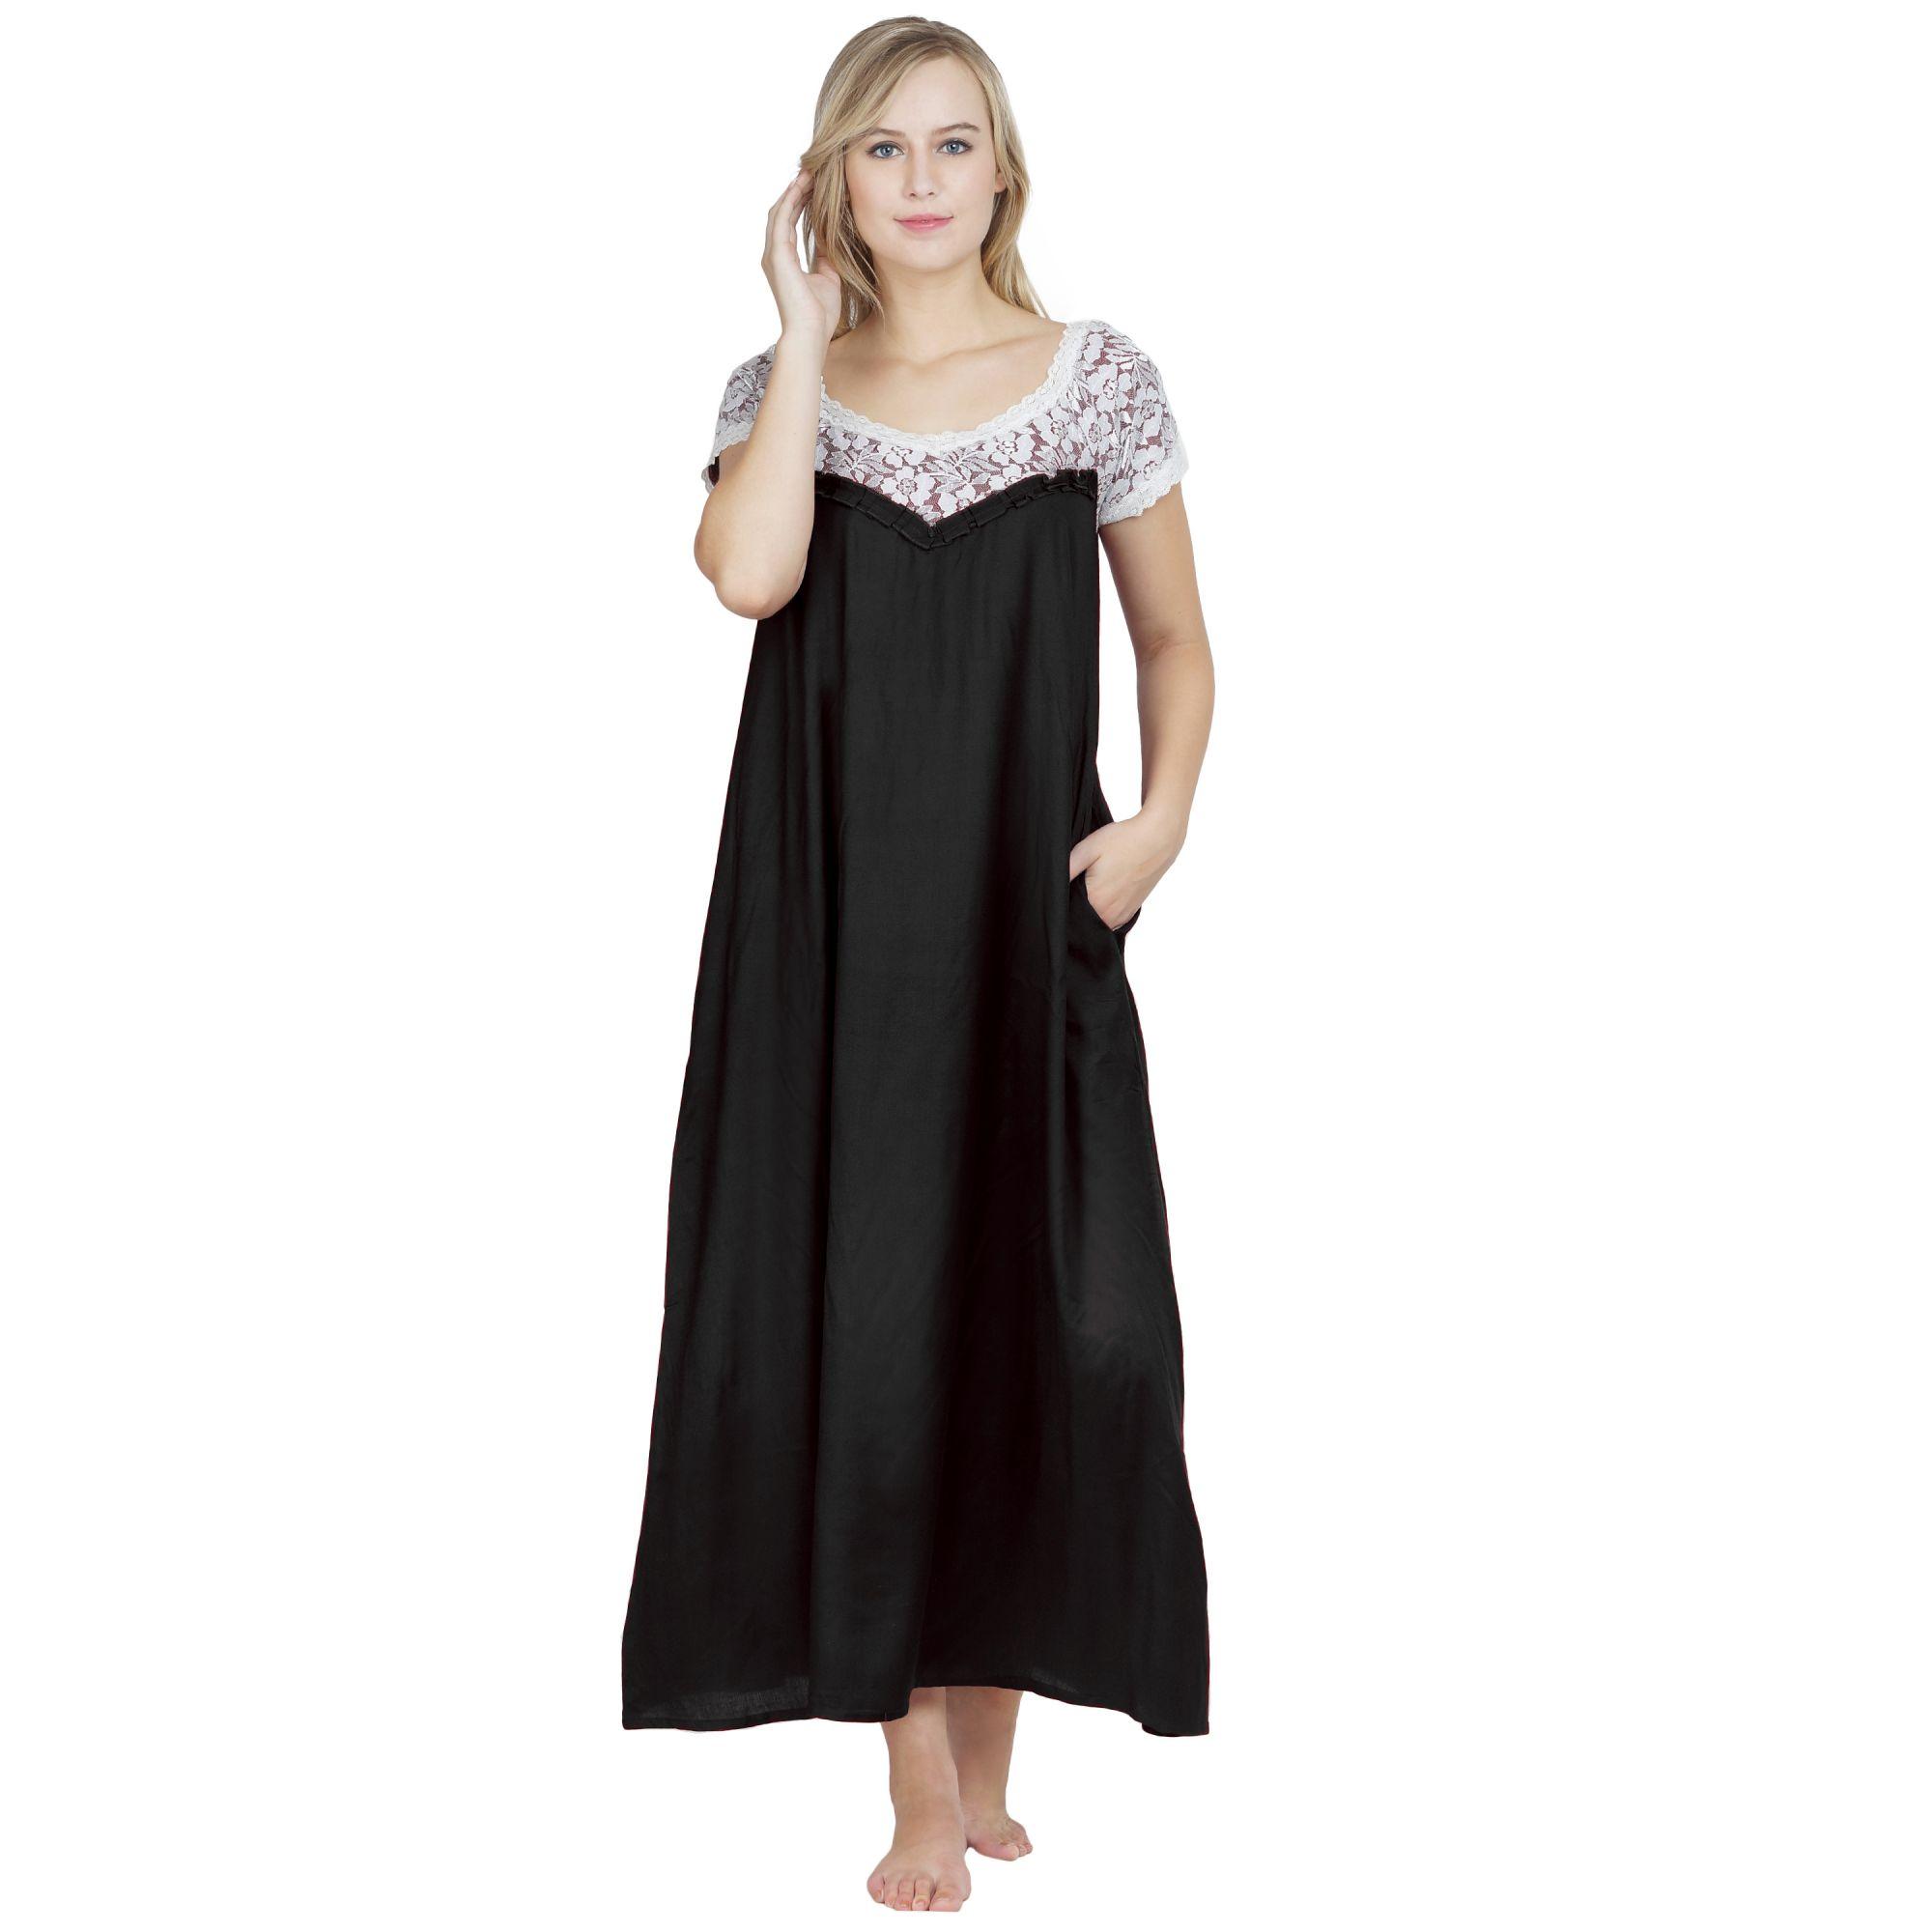 A-Line Lace Bodice Maxi Nighty in Black